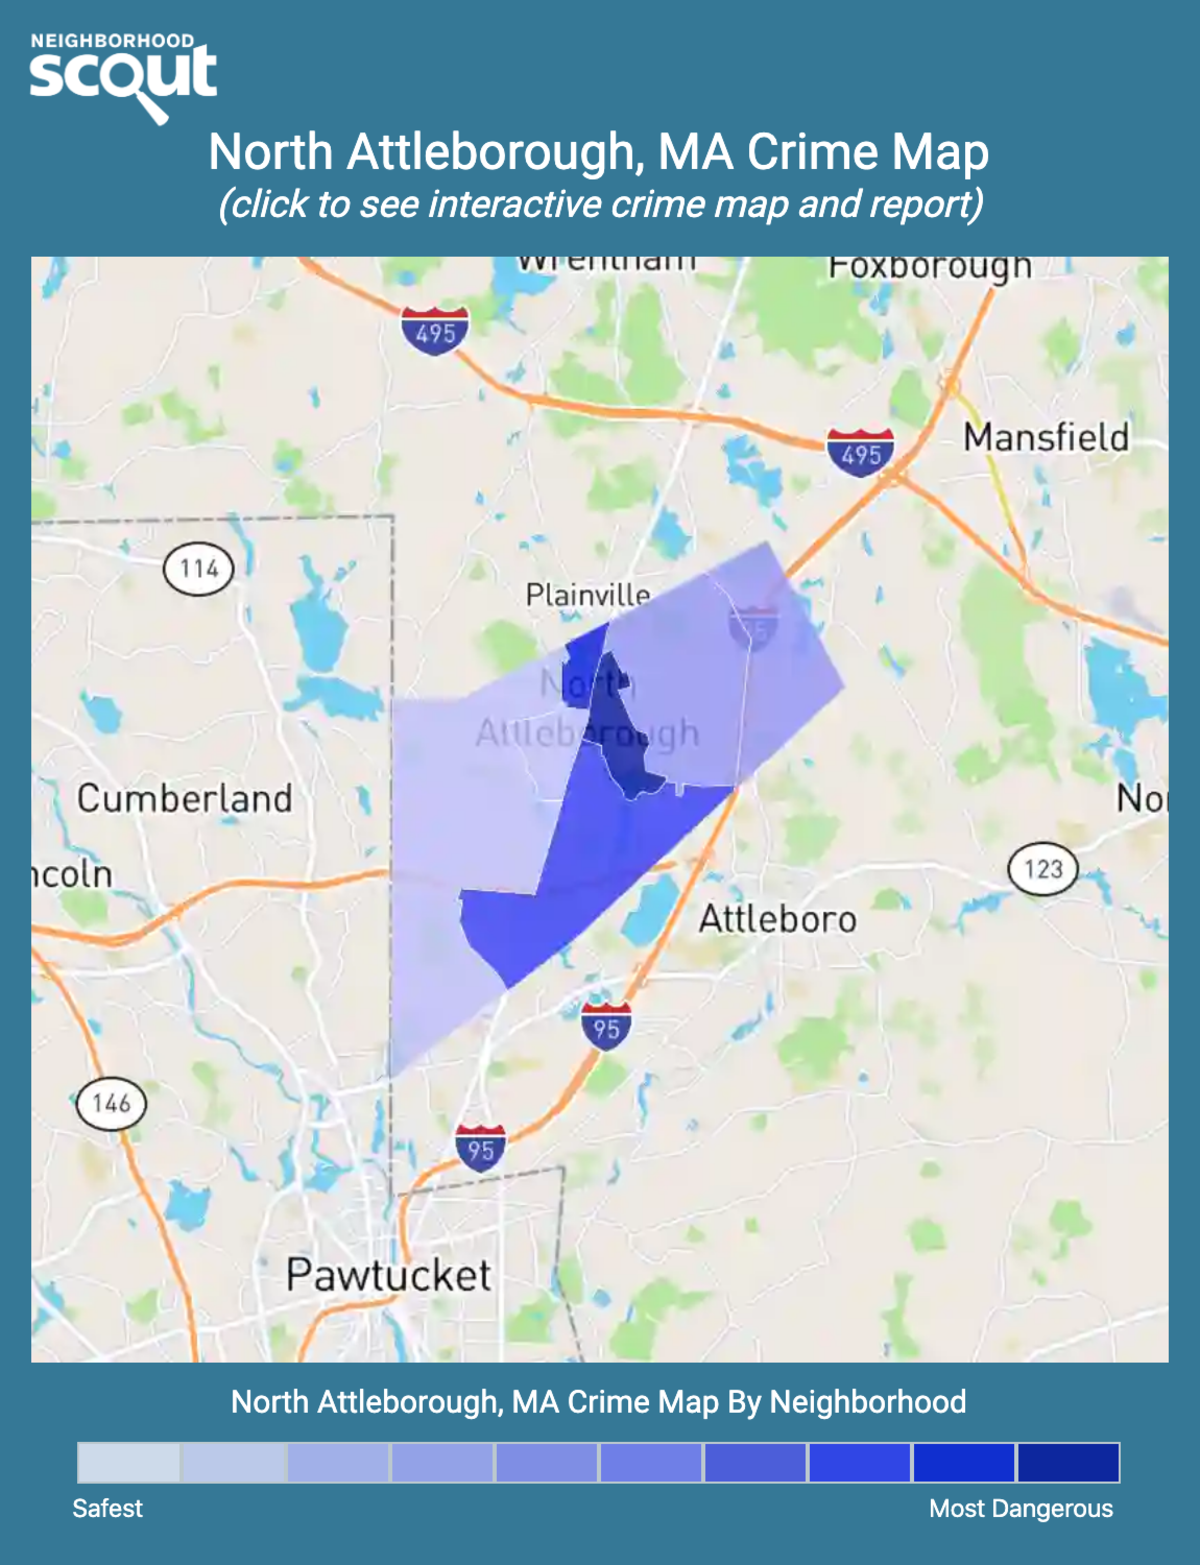 North Attleborough, Massachusetts crime map